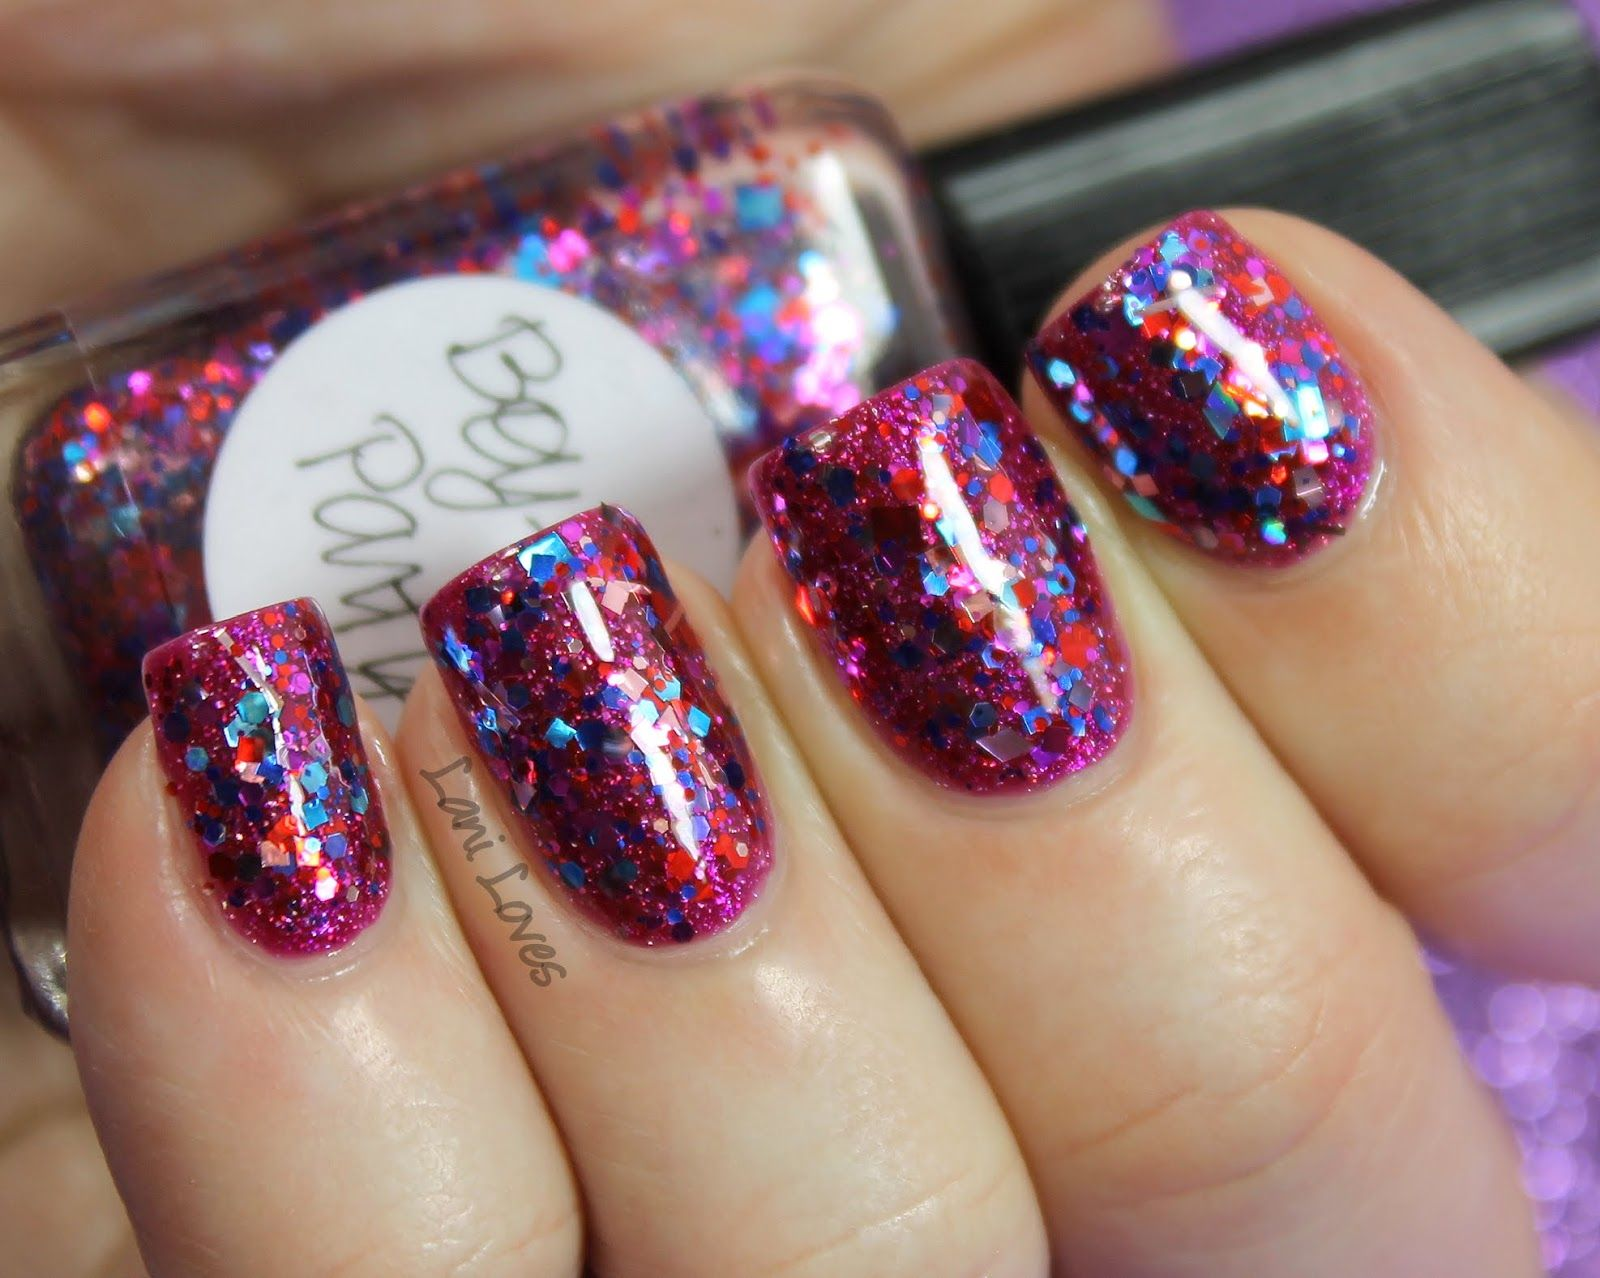 Lynnderella Boy-Girl Party nail polish swatch | Nails | Pinterest ...